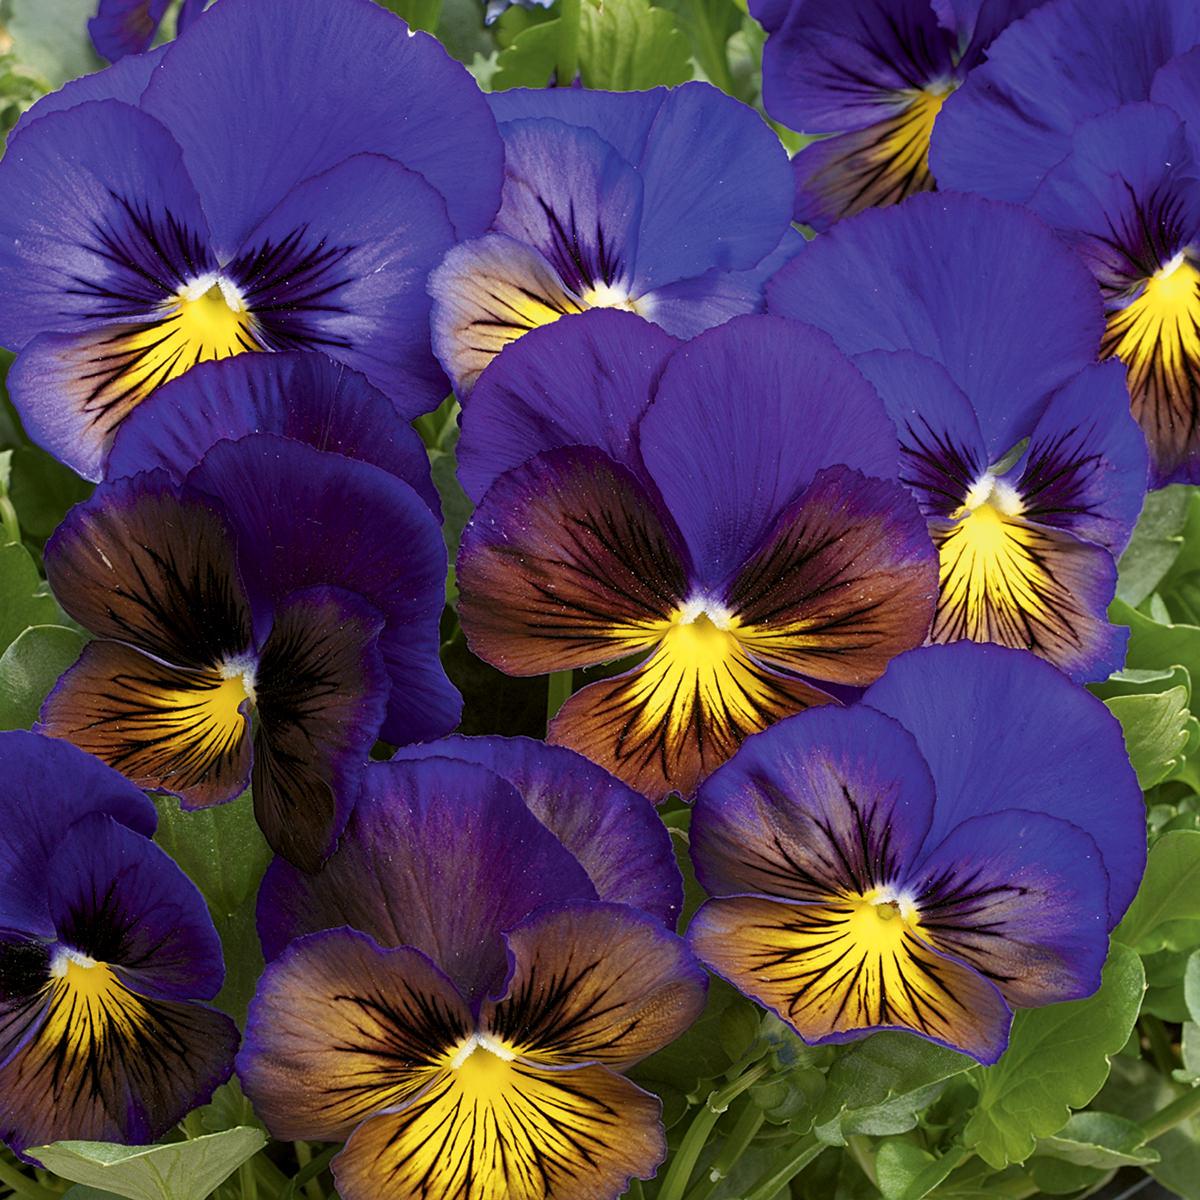 1//2 oz Blue Flax Seeds Bulk Seeds 10,000 ct Blue Flowers Heirloom Wildflowers